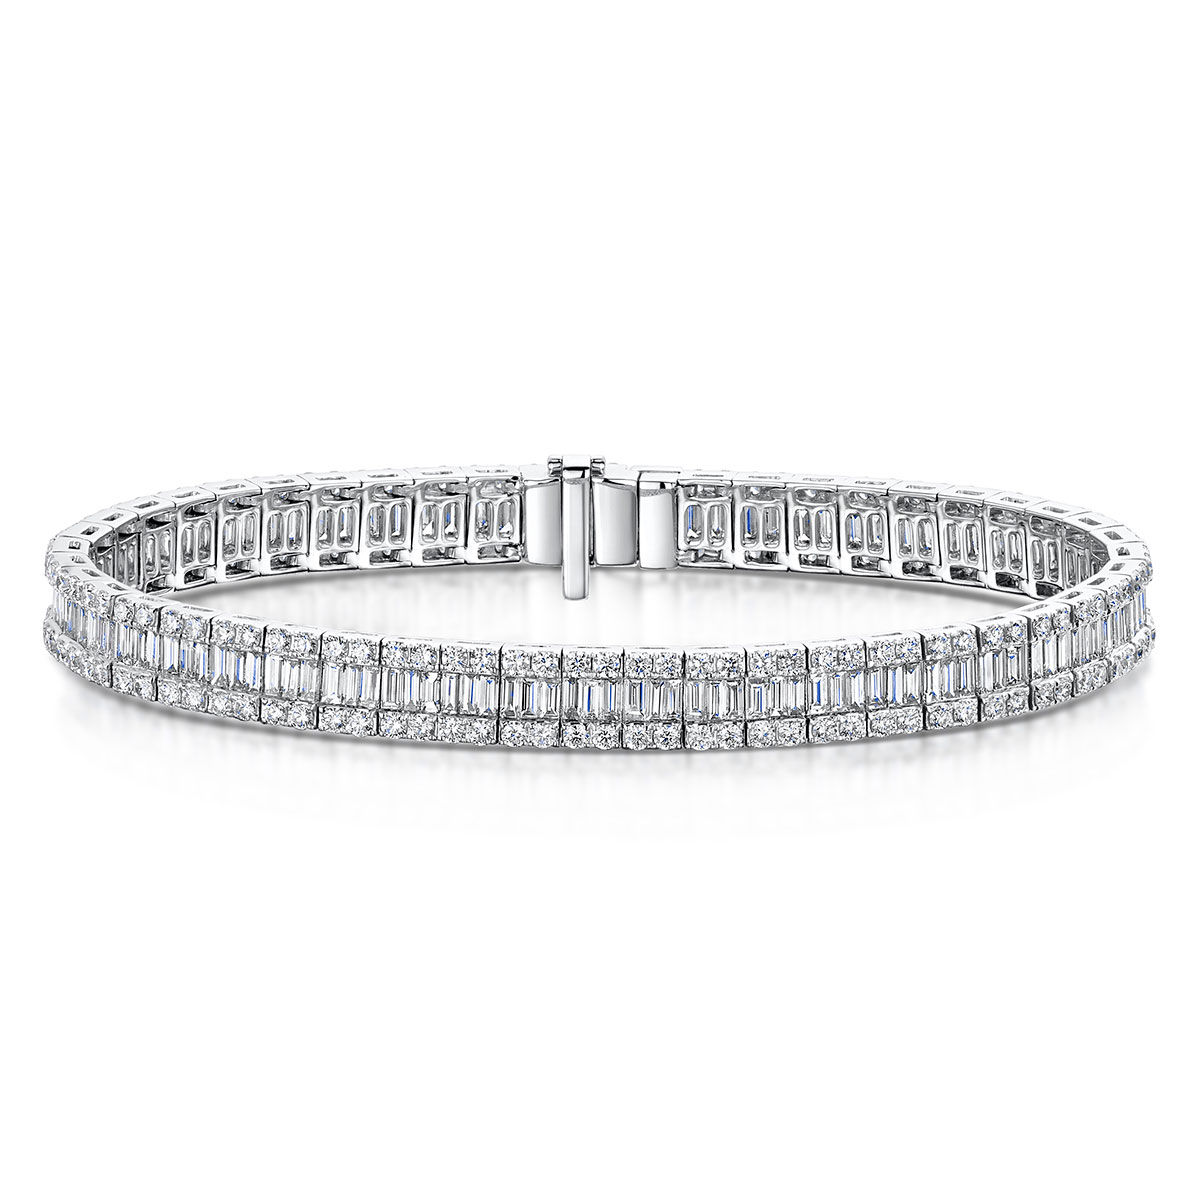 ROX Diamond Bracelet 8.30cts